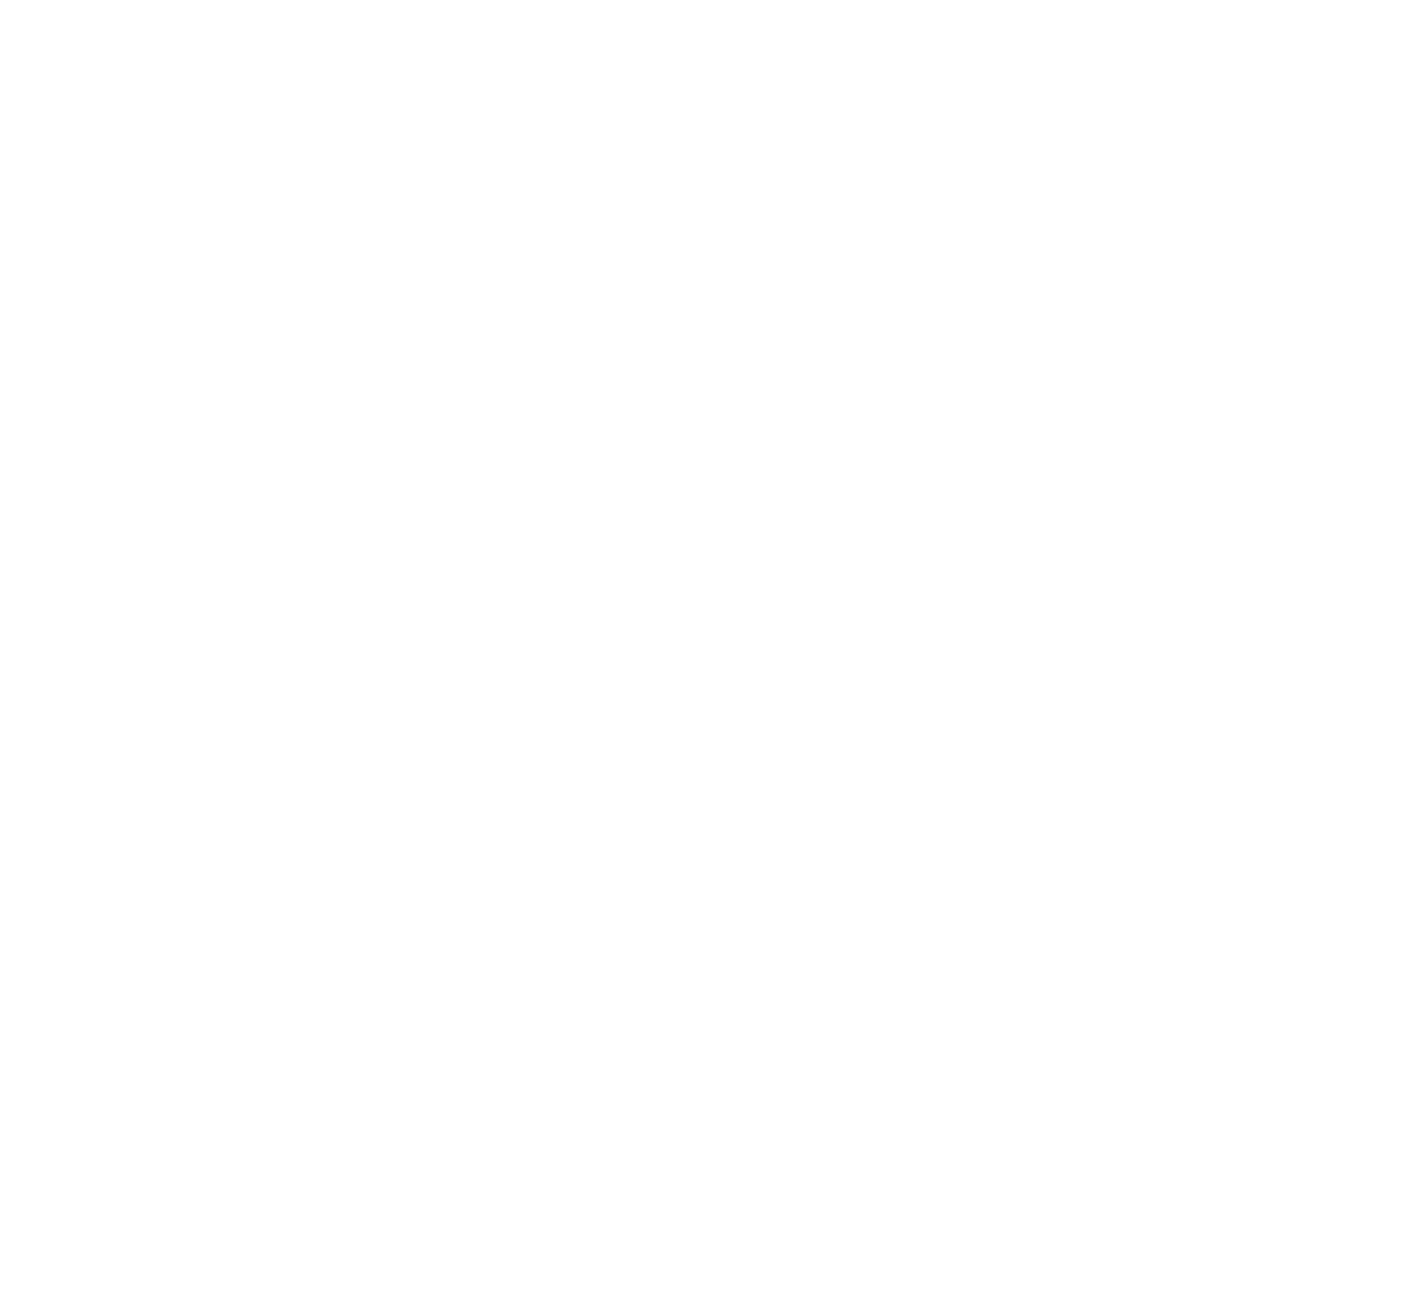 Shaw Thing Management Ltd